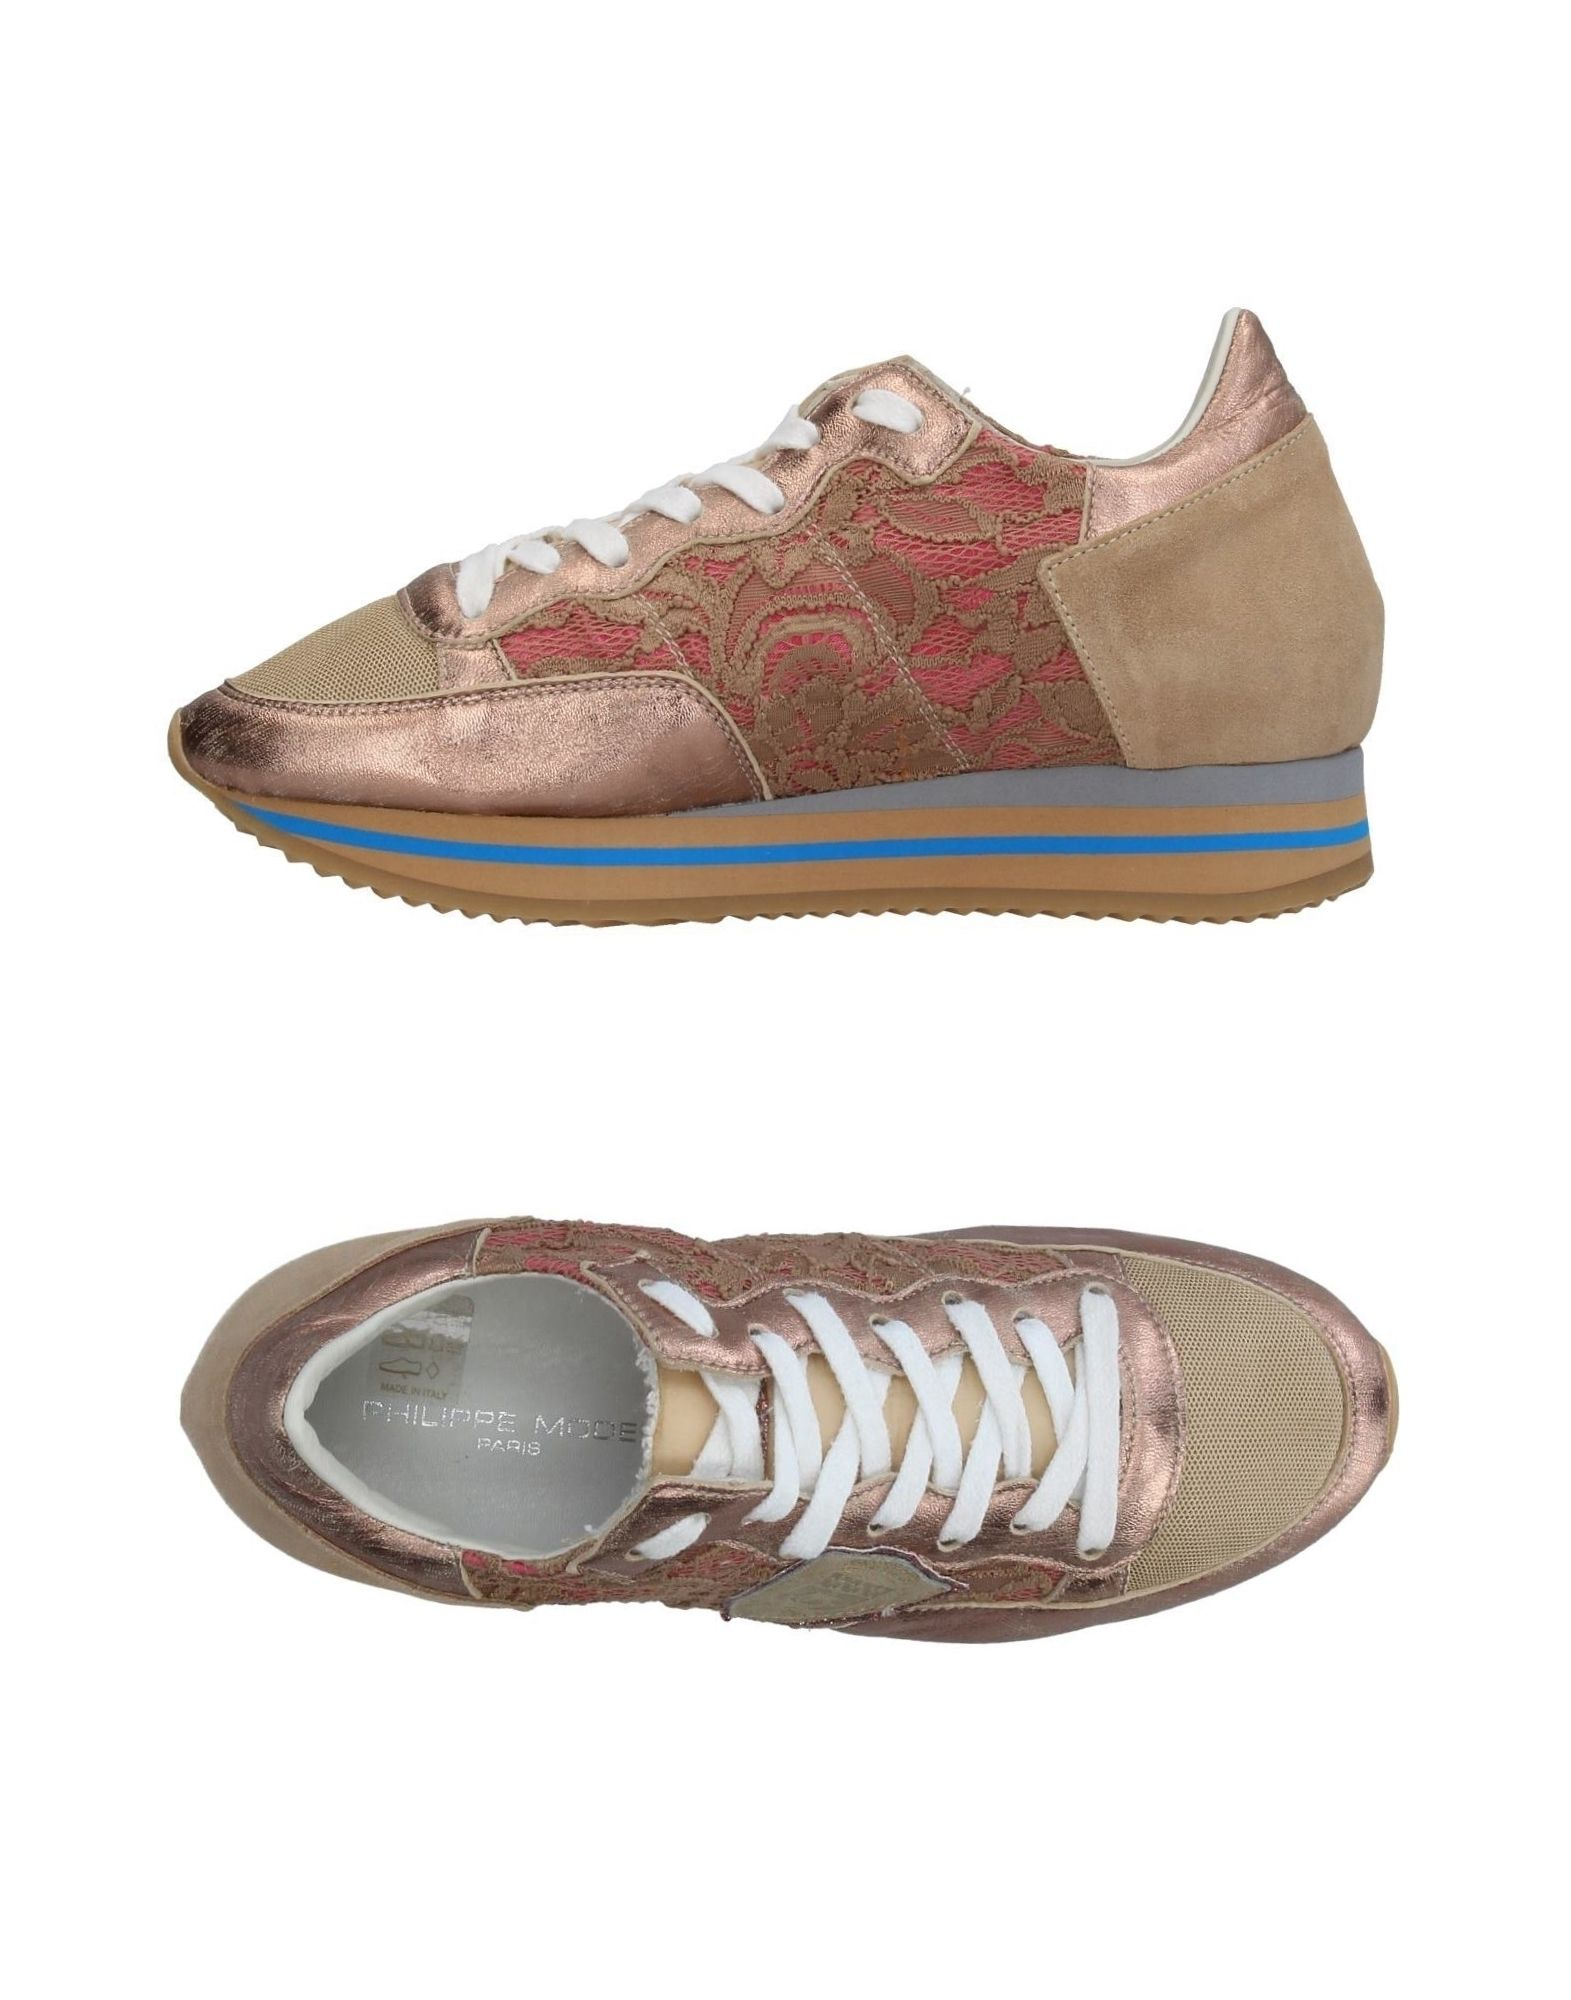 Gut um billige Schuhe Damen zu tragenPhilippe Model Sneakers Damen Schuhe  11355253GP 84247d